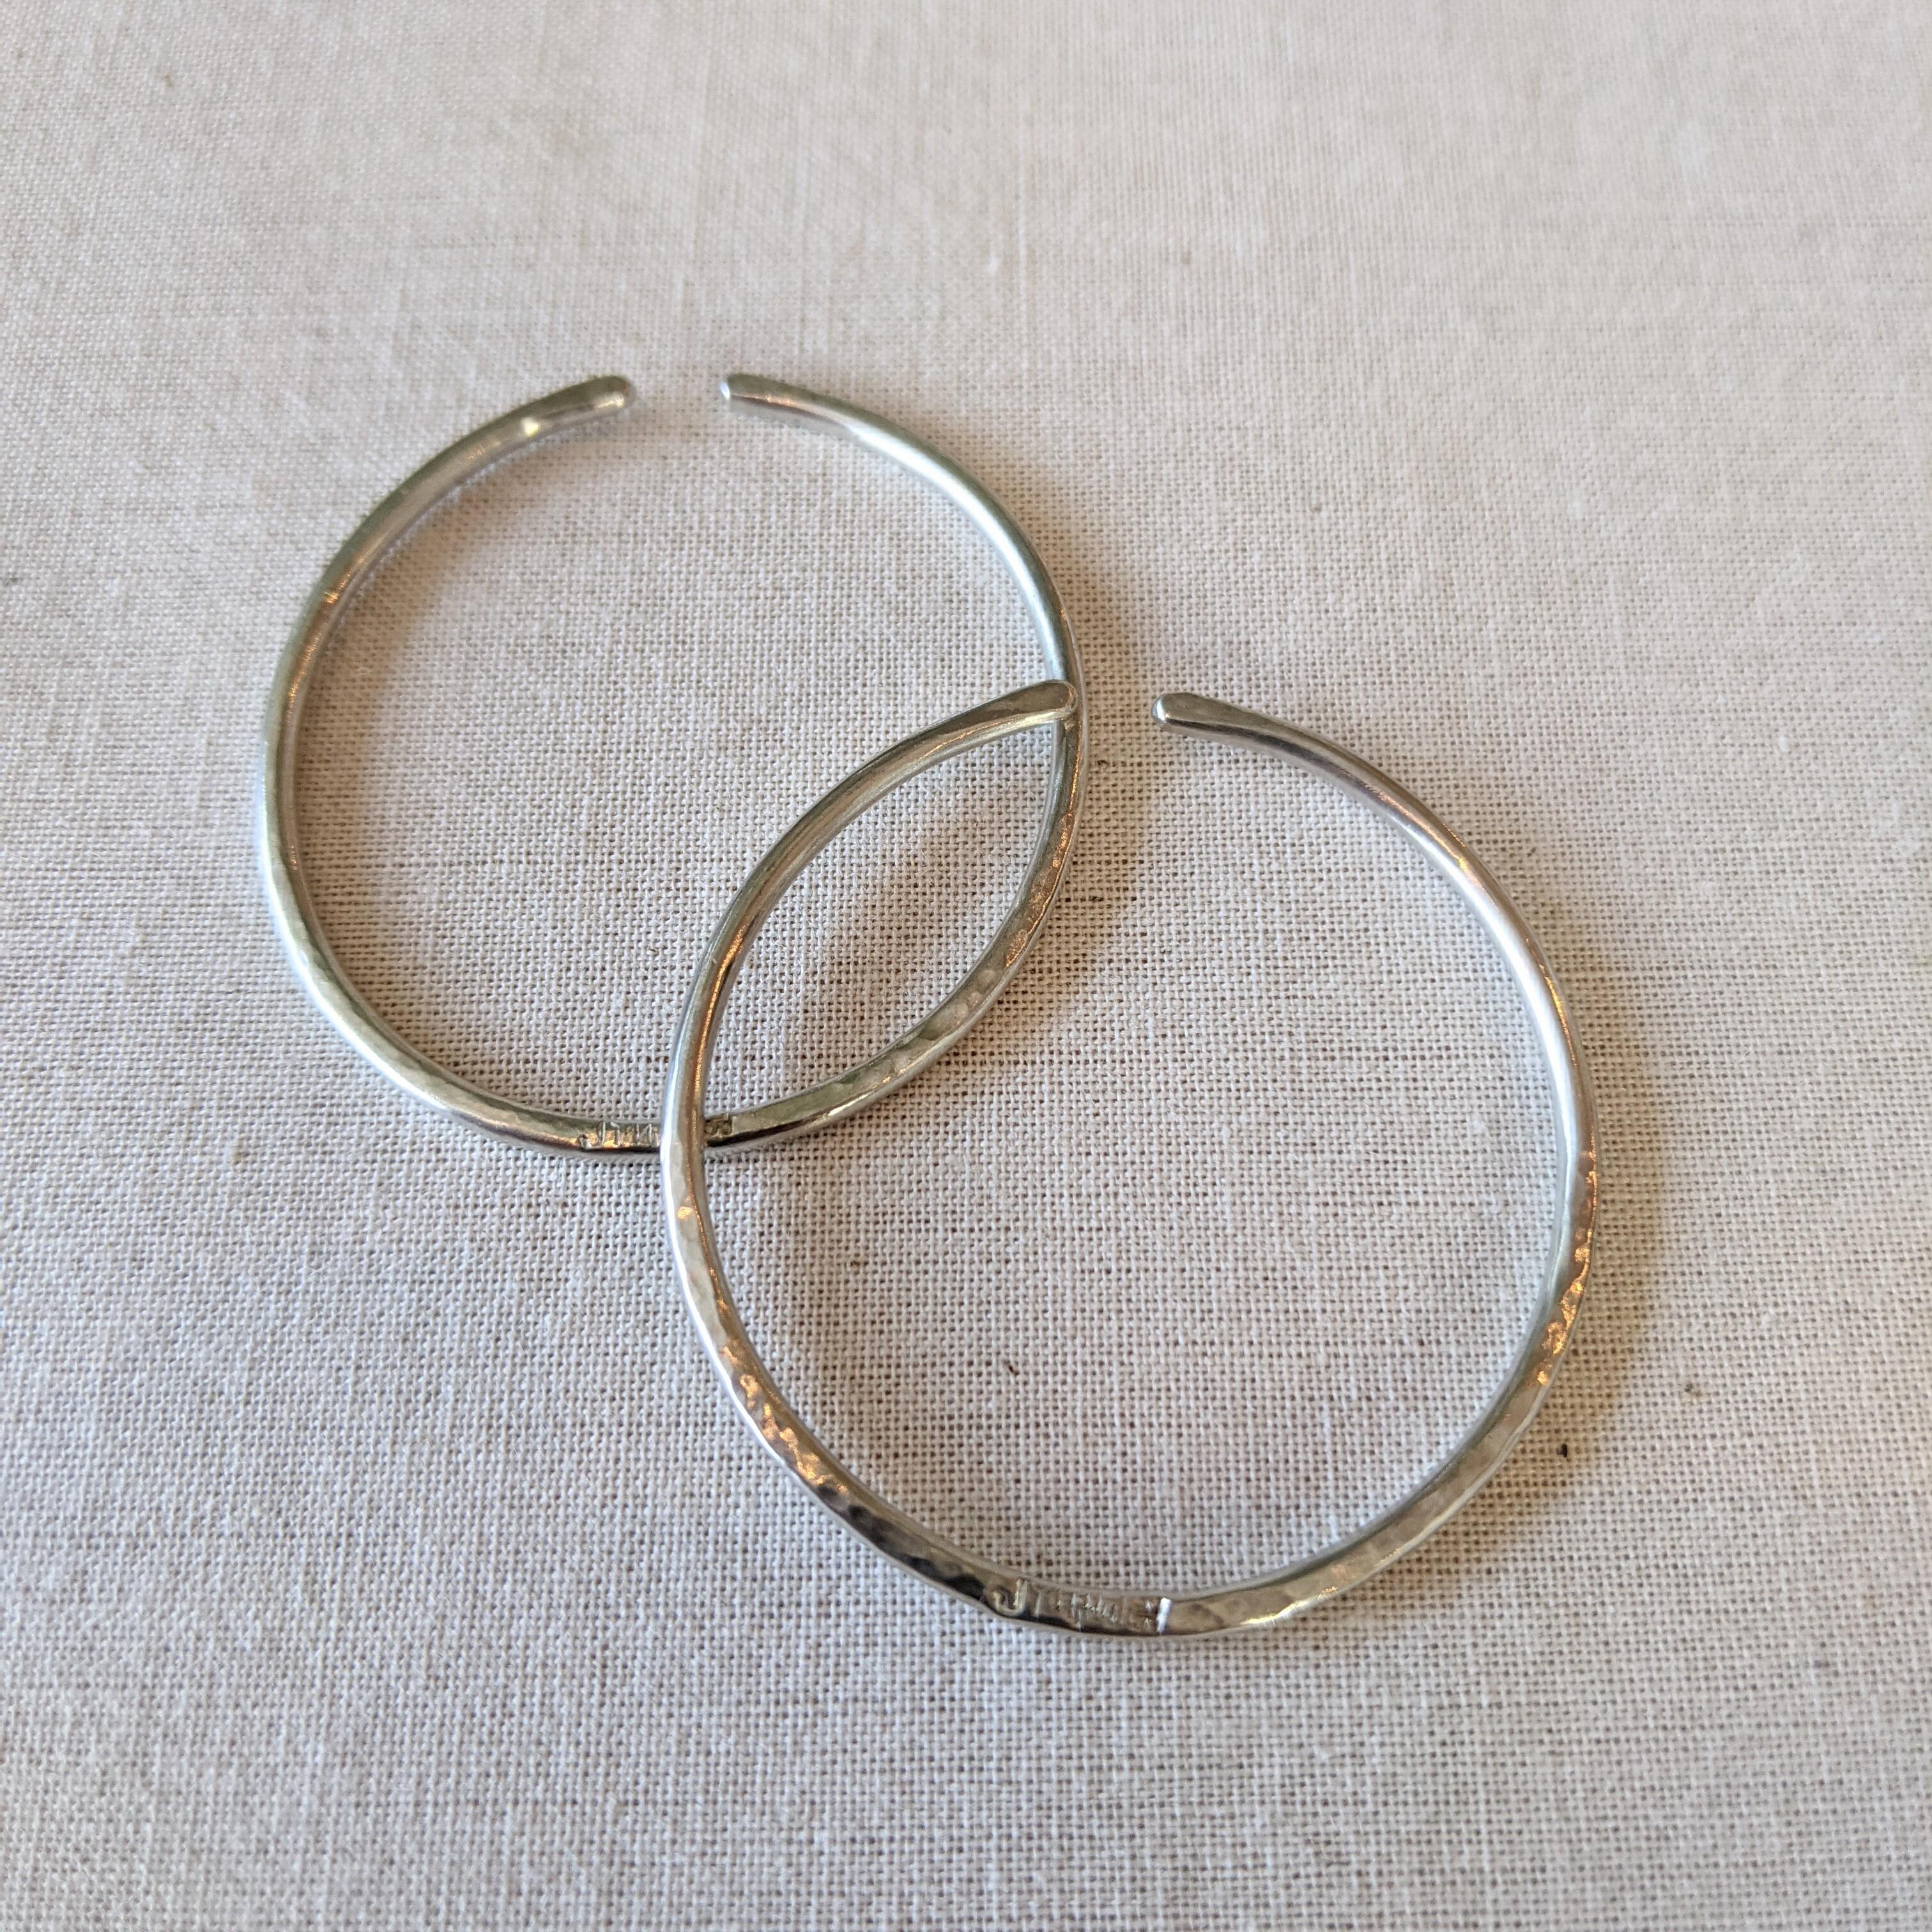 【 jomathwich 】silver  earcuff  / シルバー素材 / 2本set item /  E-big circle  イヤーカフ